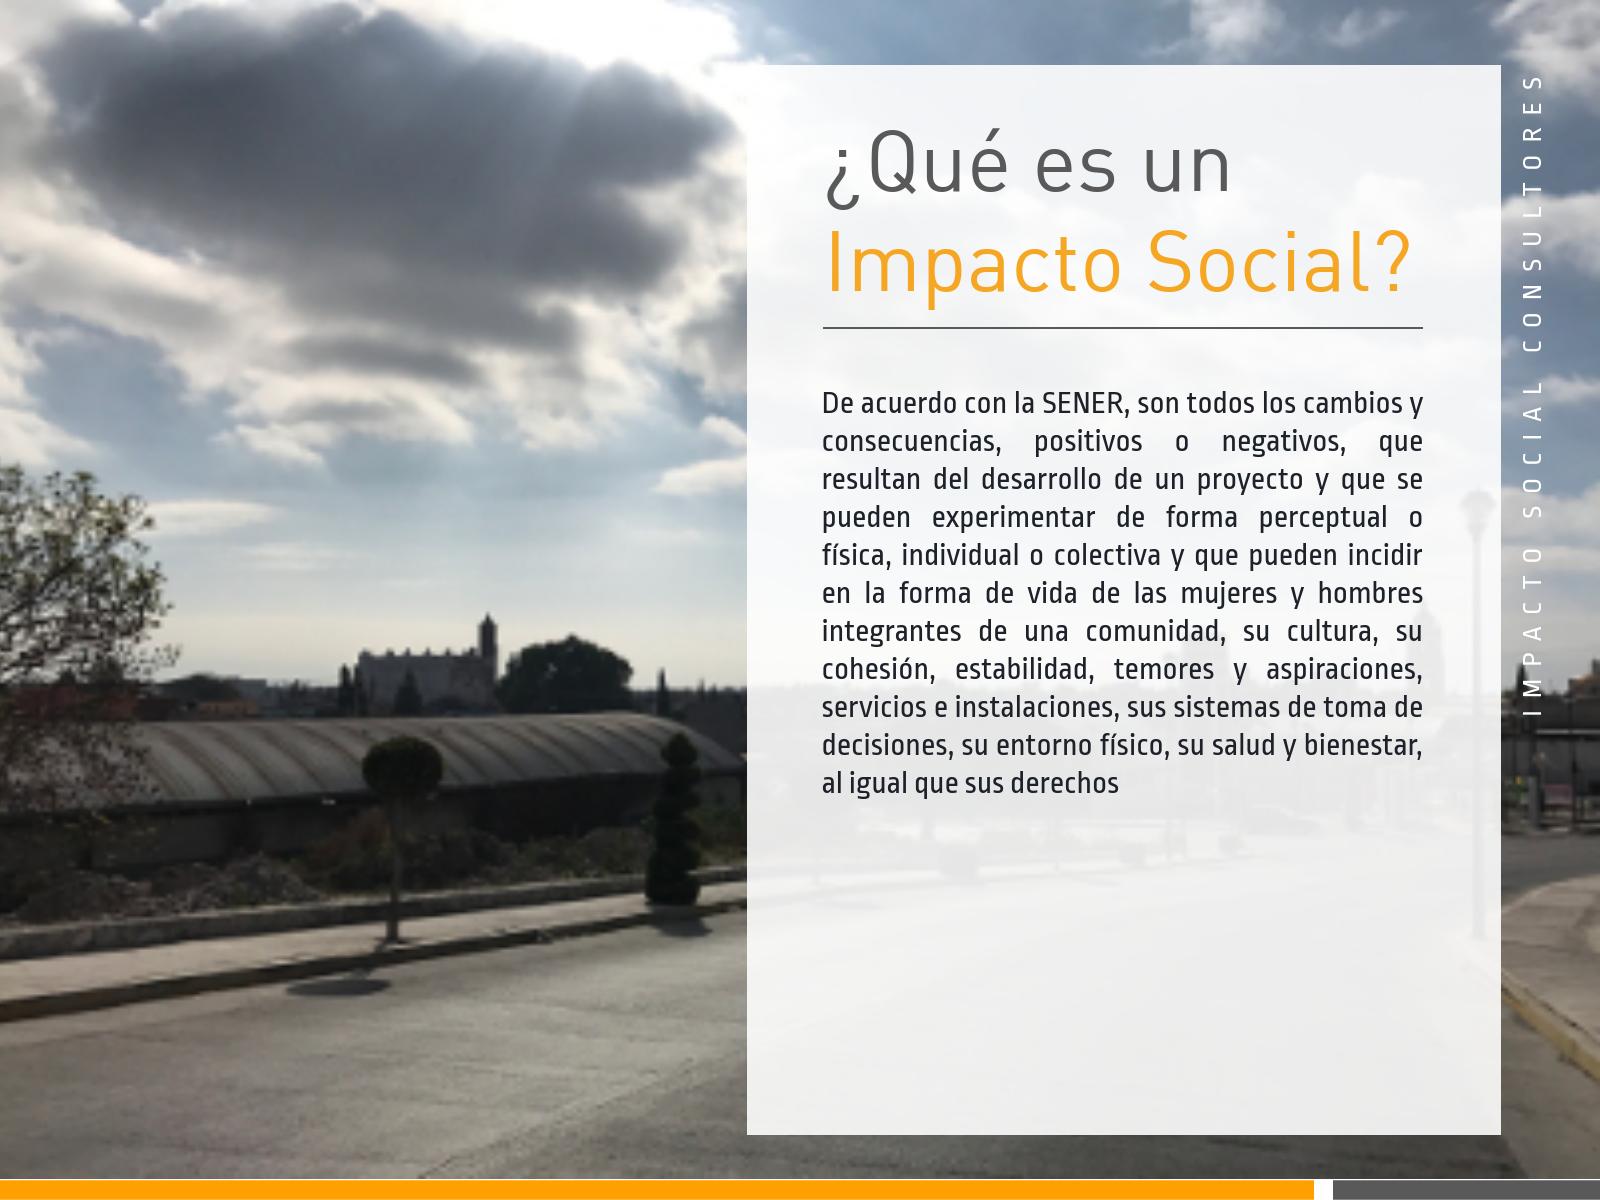 IMPACTO_SOCIAL.png